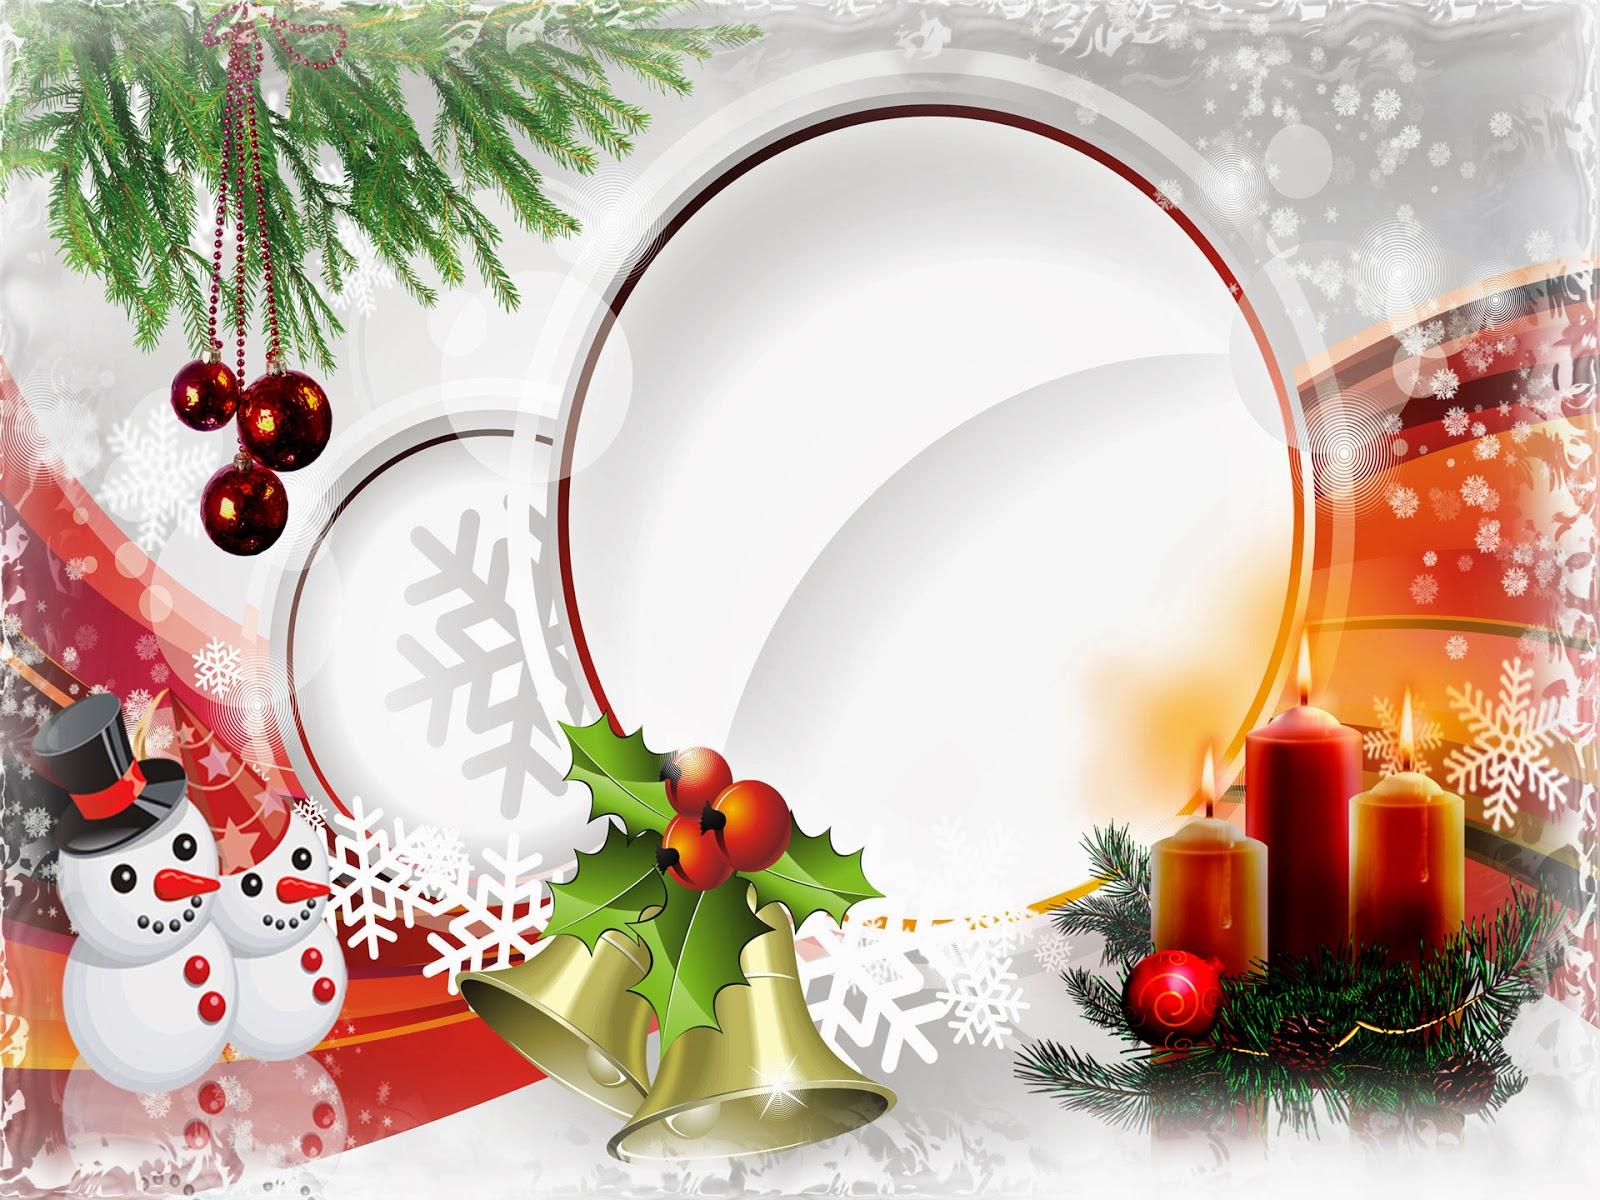 jingle bells christmas songs mp3